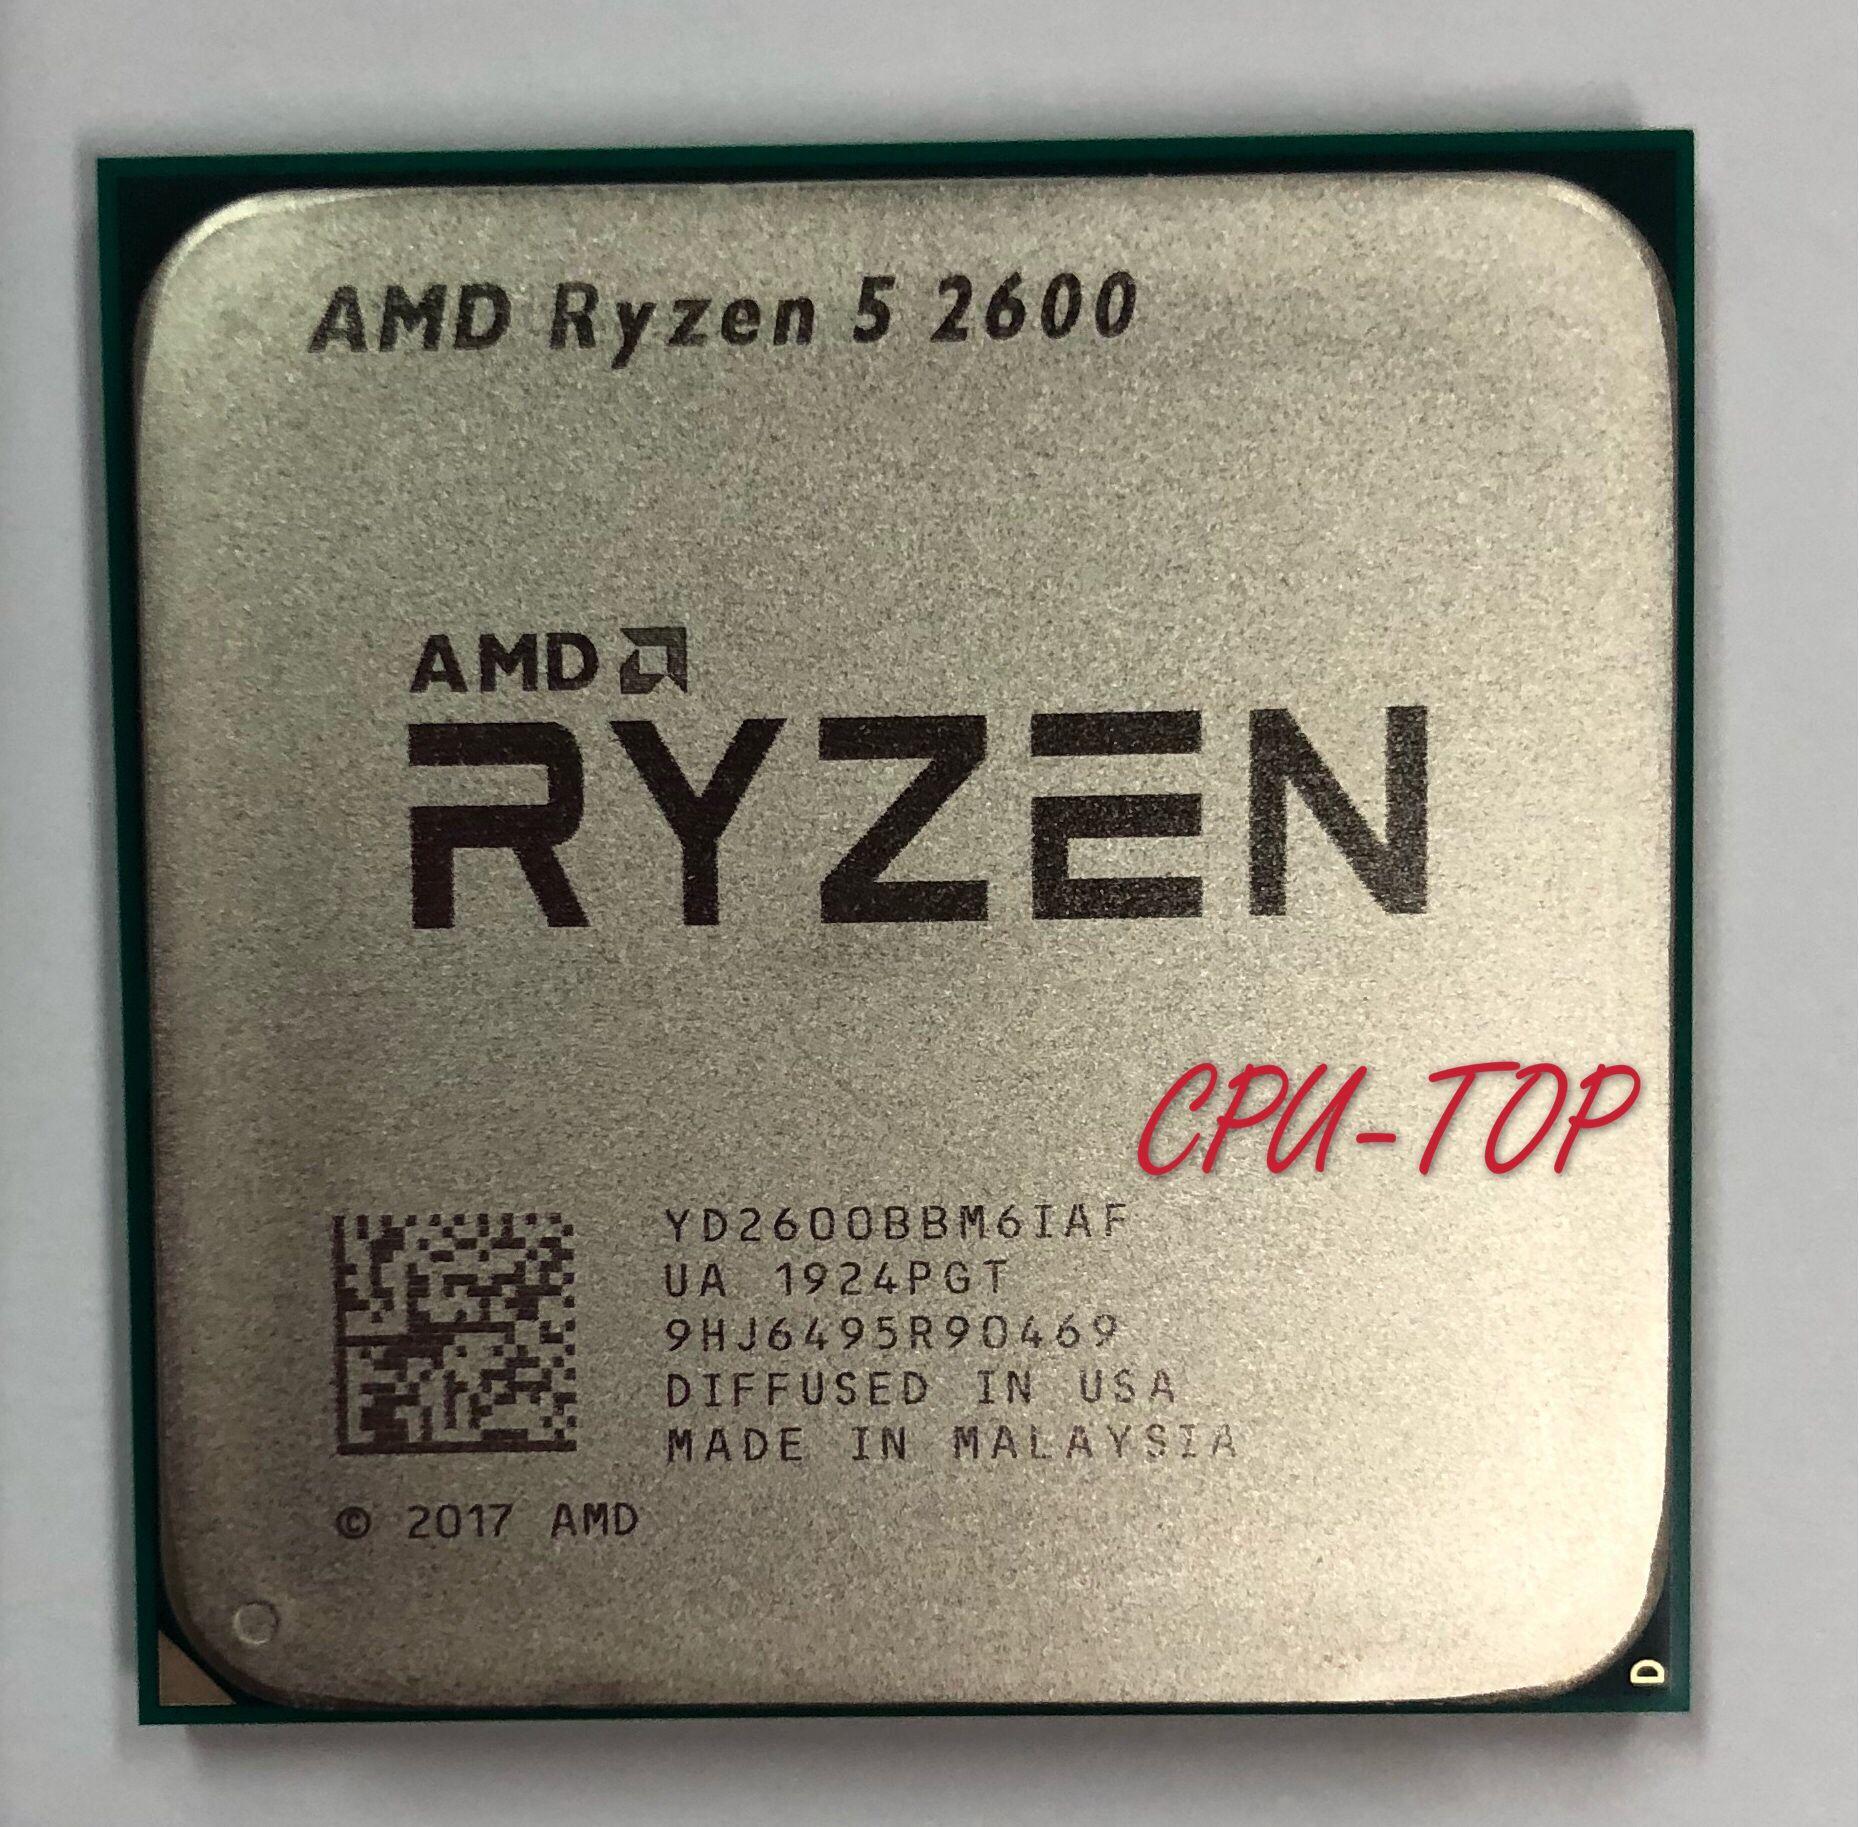 AMD Ryzen 5 2600 R5 2600 de 3,4 GHz Six-Core 12-65 W CPU procesador YD2600BBM6IAF hembra AM4